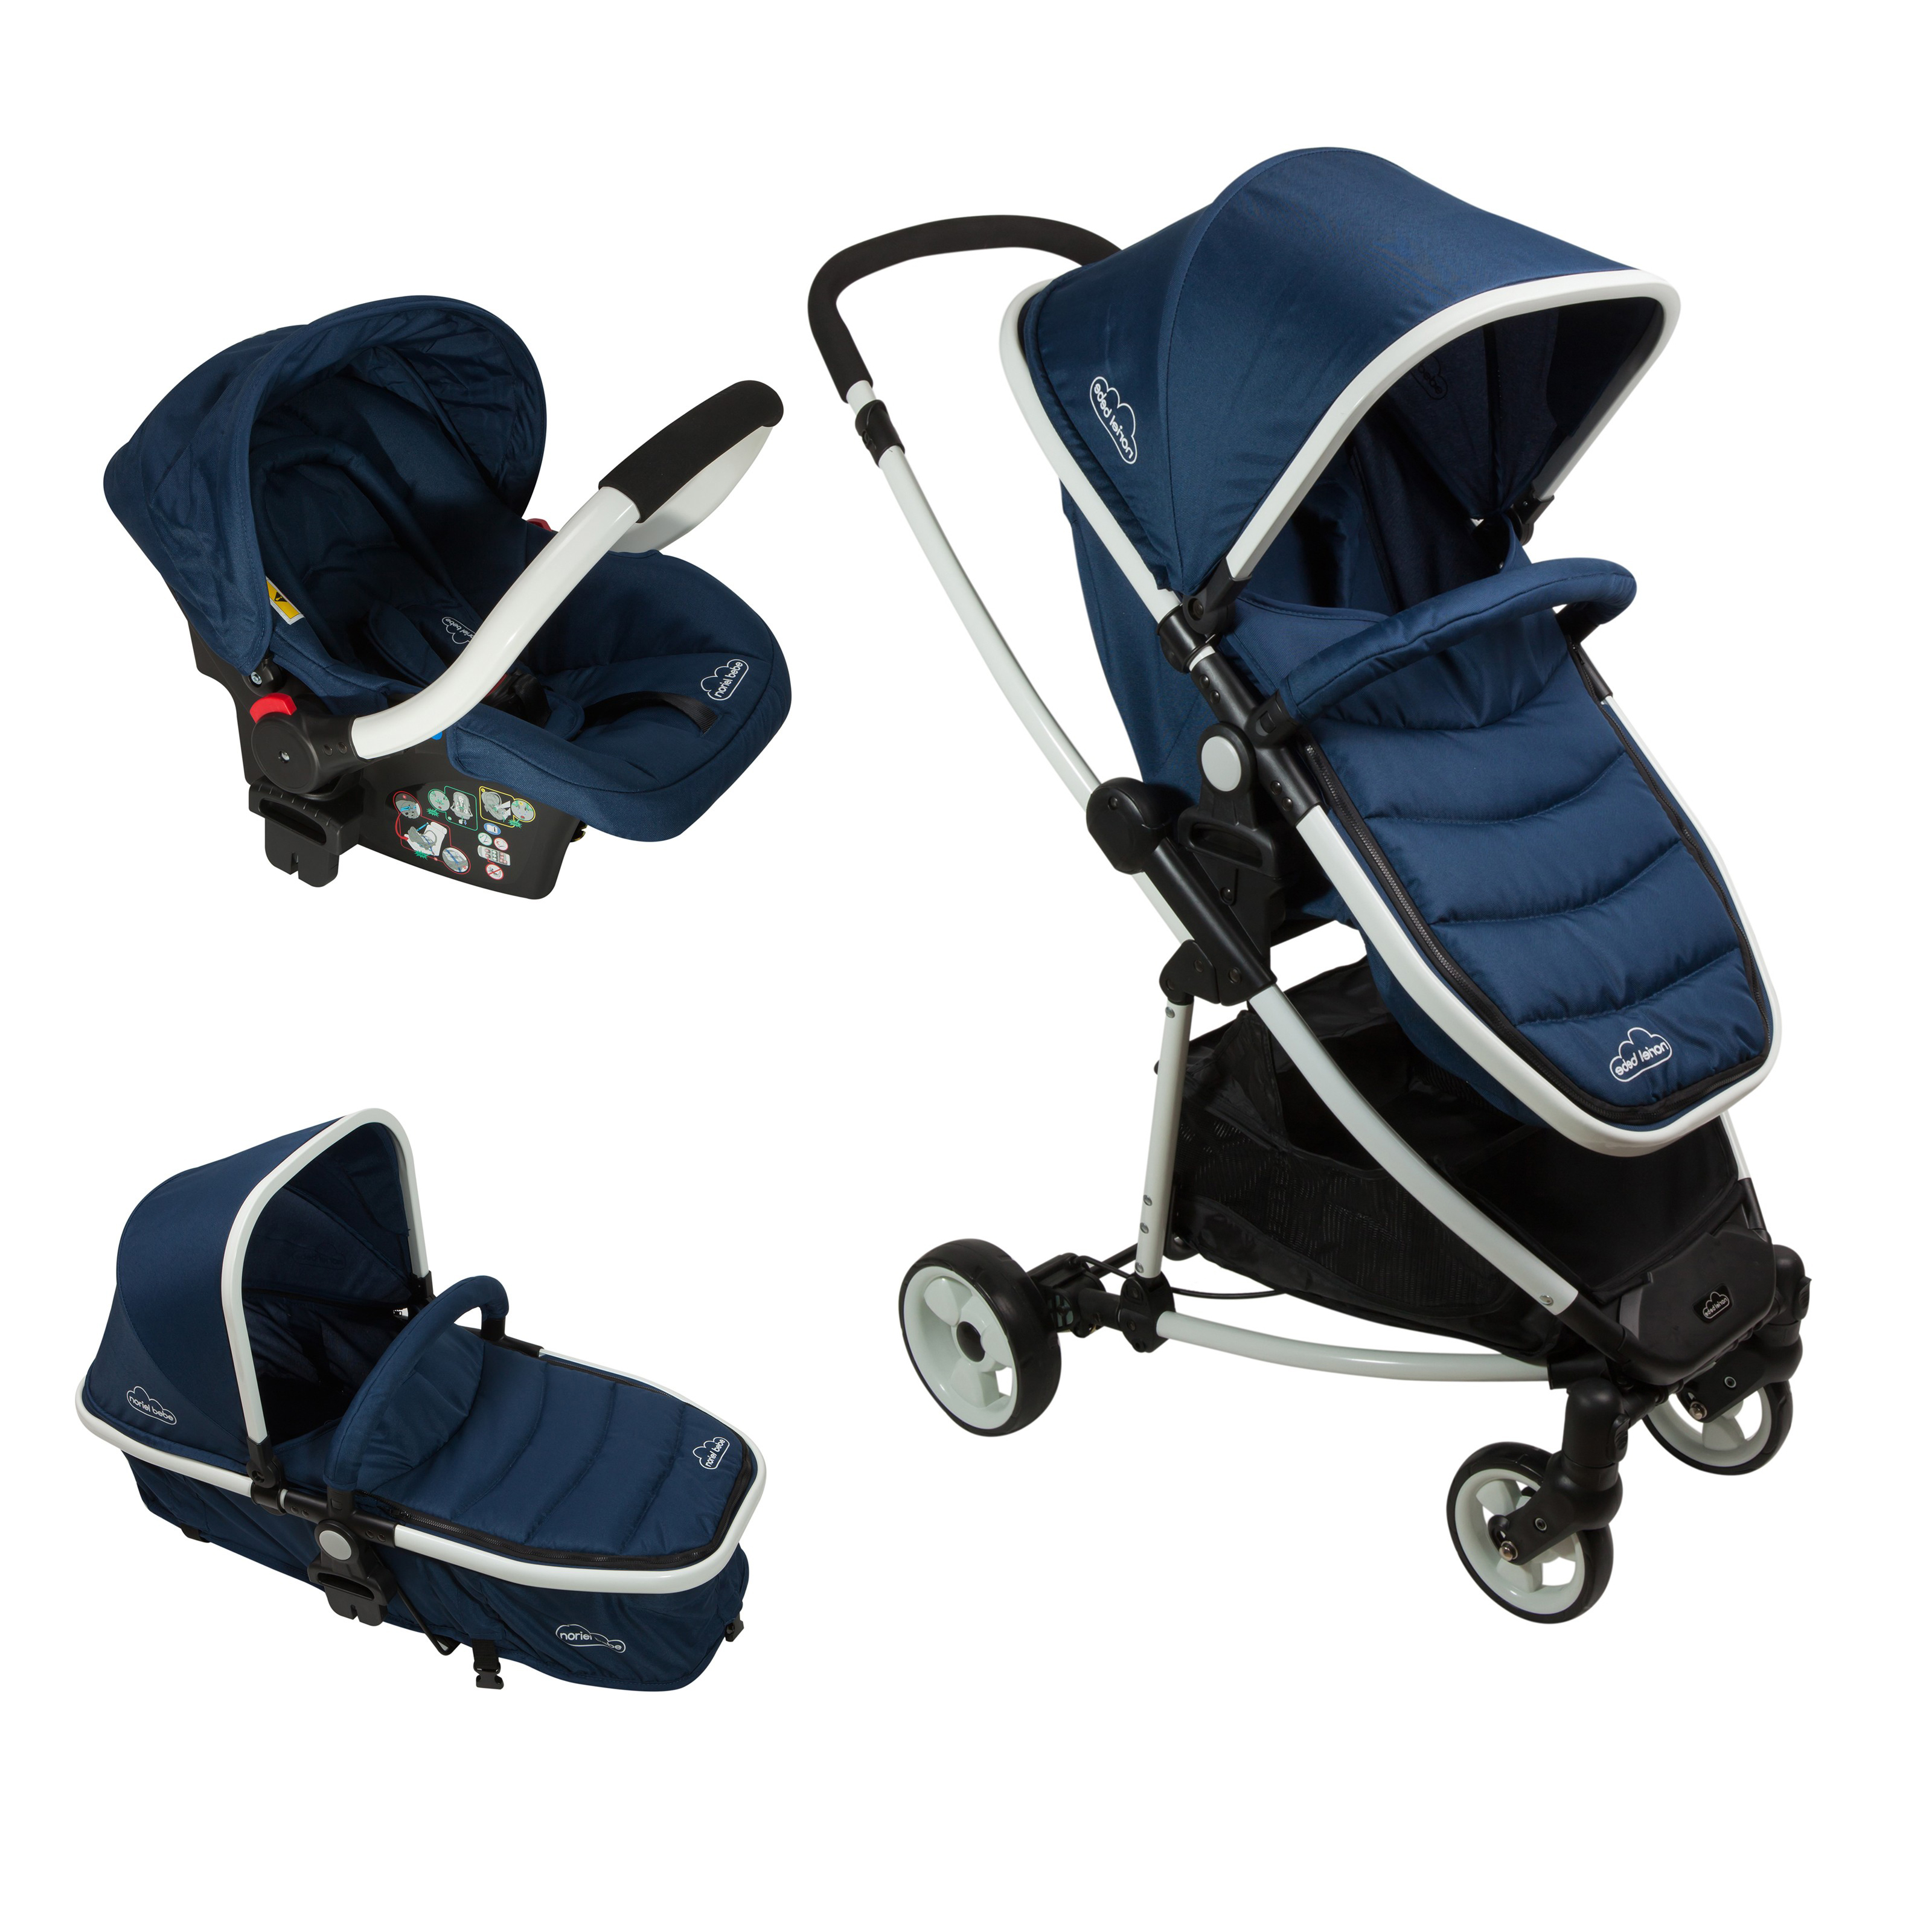 carucior copii 3 in 1 noriel bebe - bleumarin